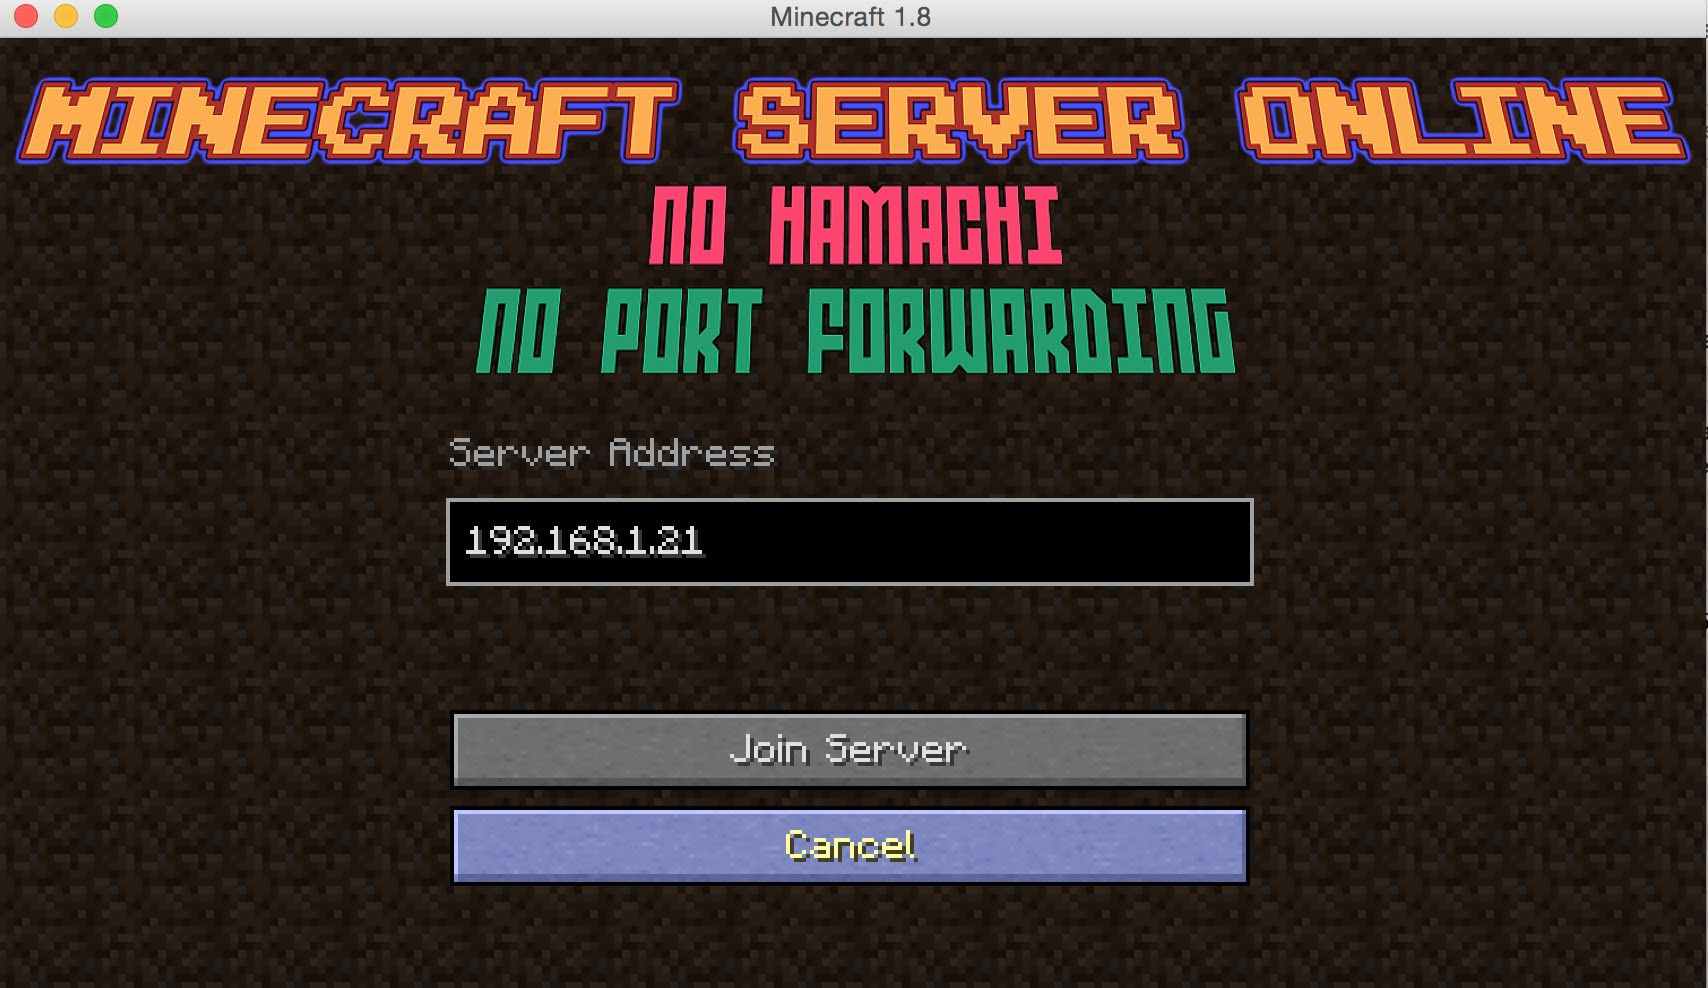 portforwardingminecraft.jpg